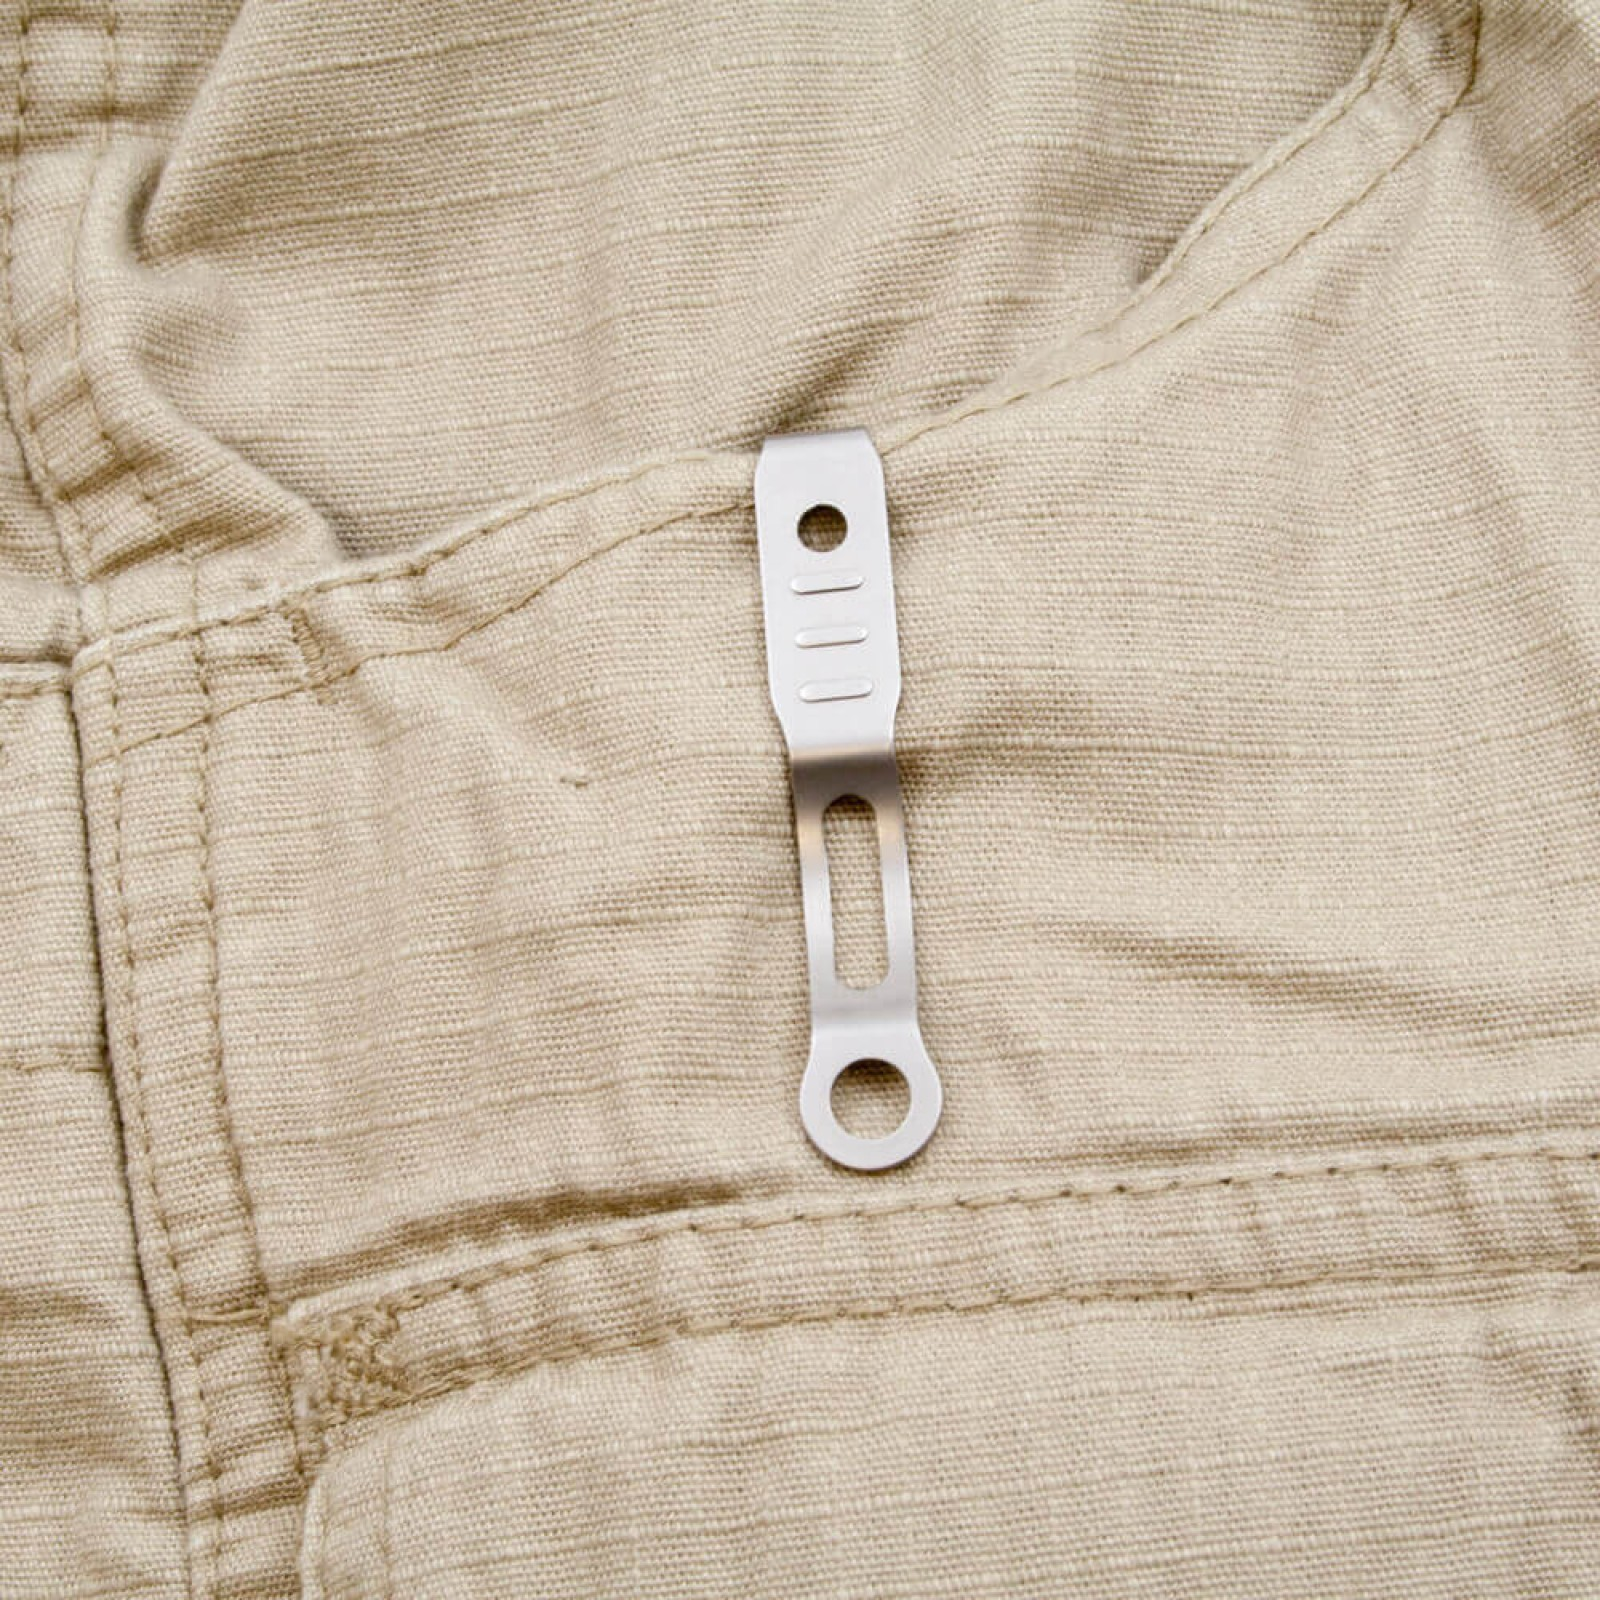 Фото 7 - Складной нож Flash II - SOG FSA8, сталь AUS-8, рукоять термопластик GRN